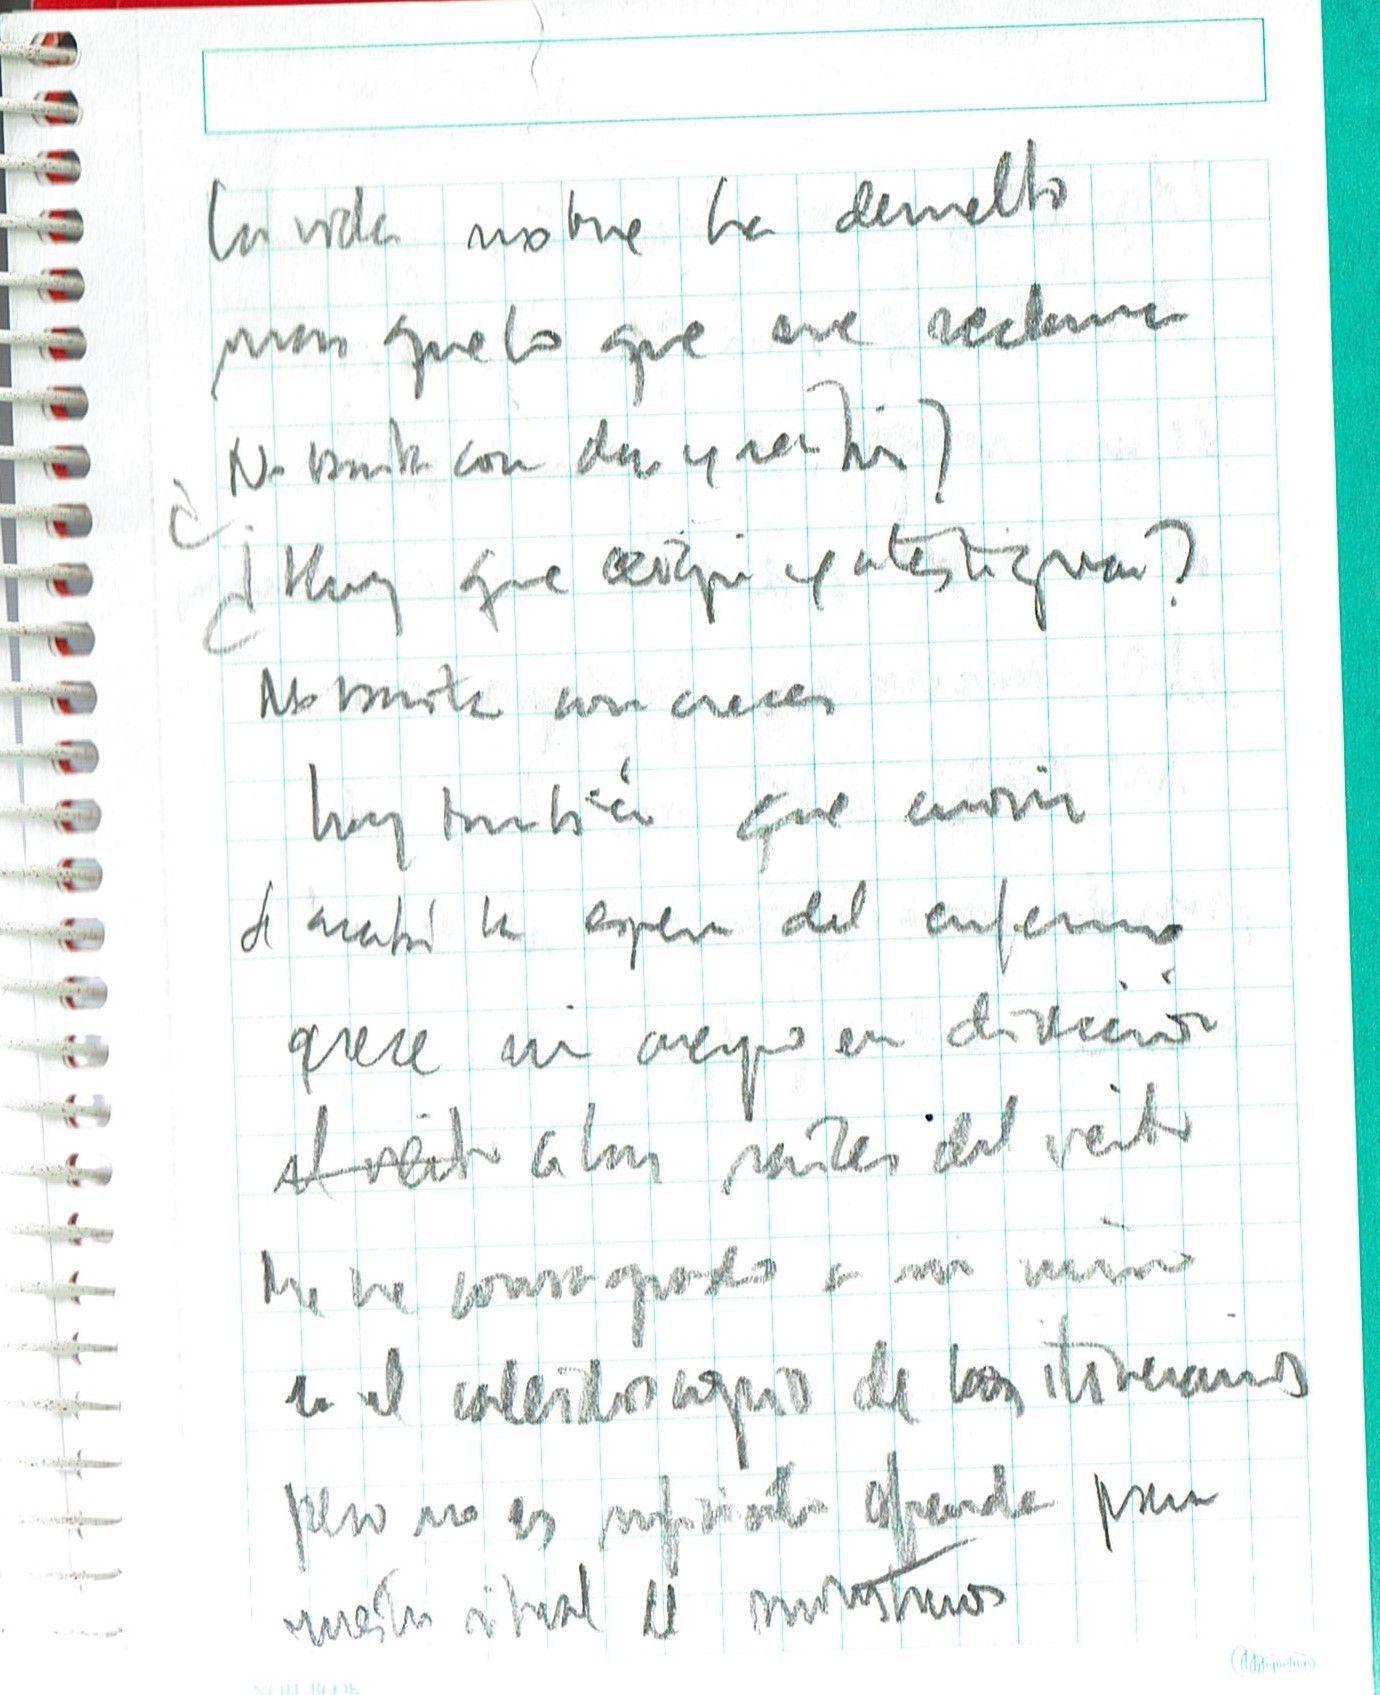 Texto manuscrito nº 33